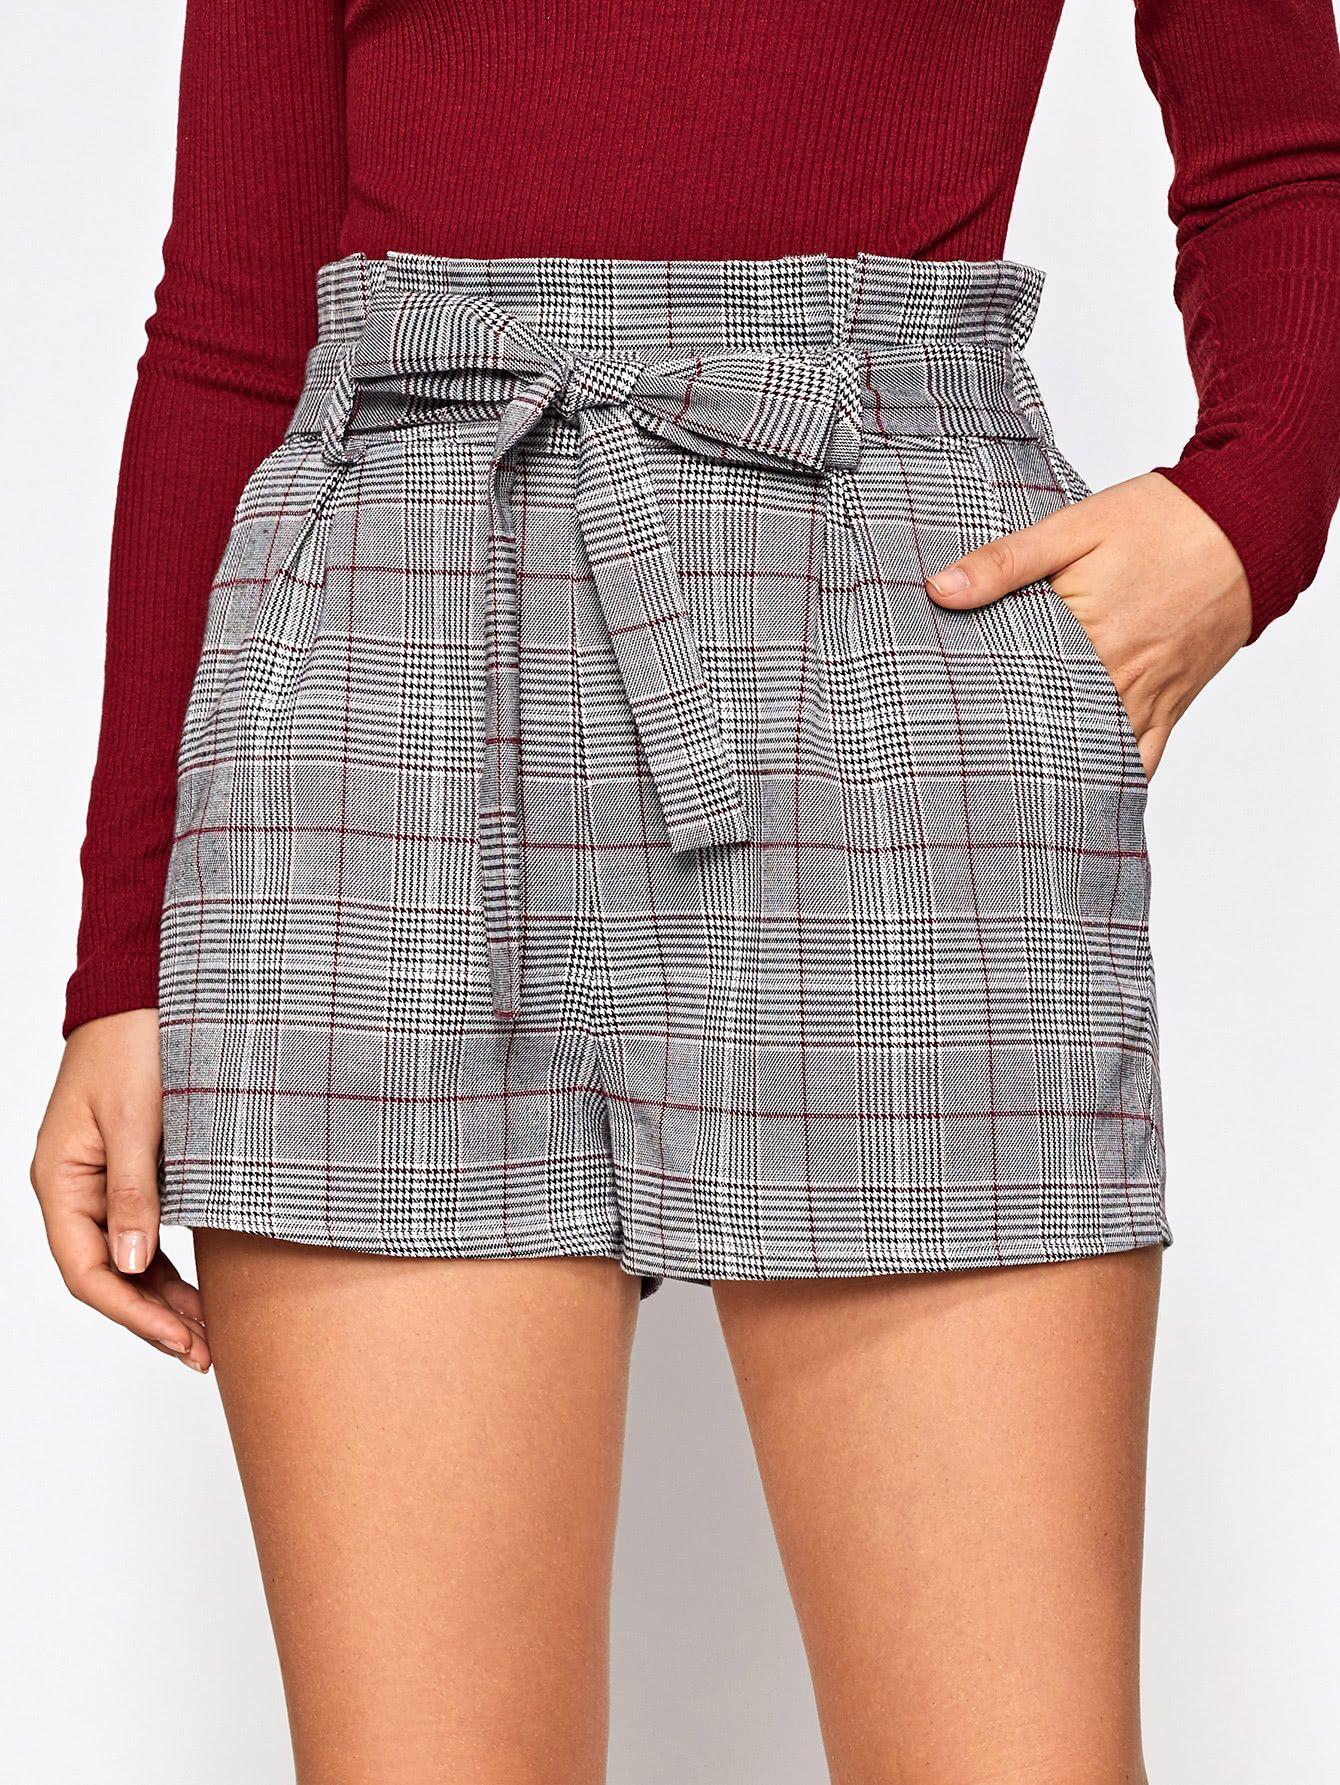 efa076ef38 Shop Bow Tie Ruffle Waist Tailored Check Shorts online. SheIn offers Bow Tie  Ruffle Waist Tailored Check Shorts & more to fit your fashionable needs.